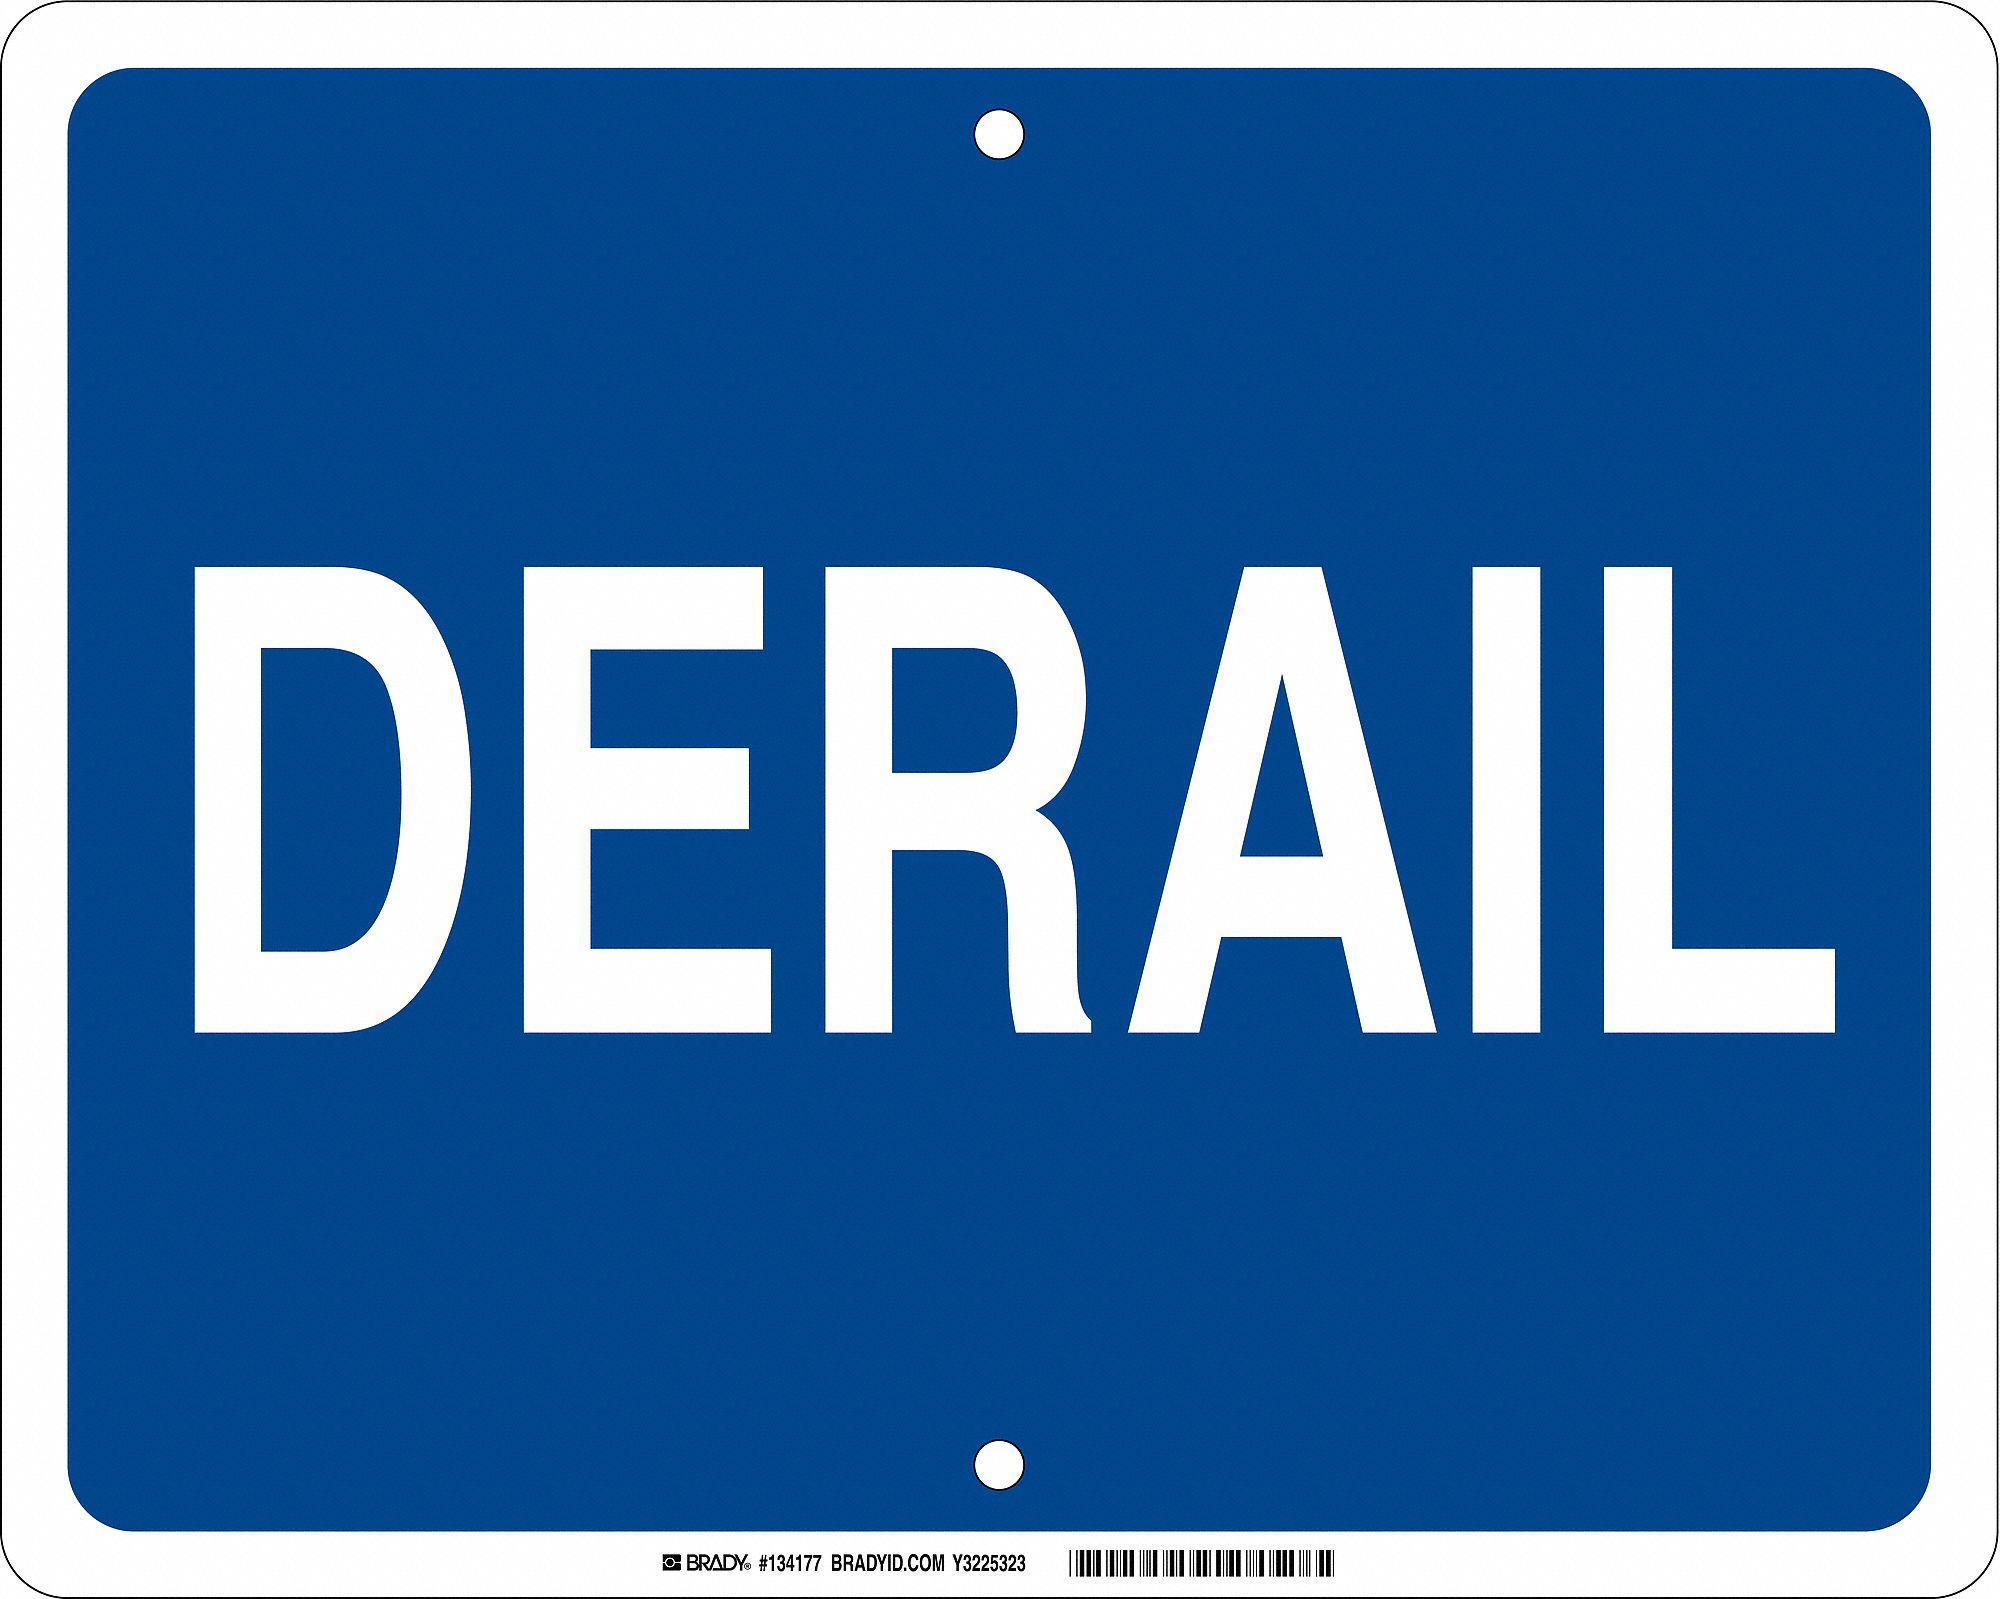 Railroad Blue Flag Signs